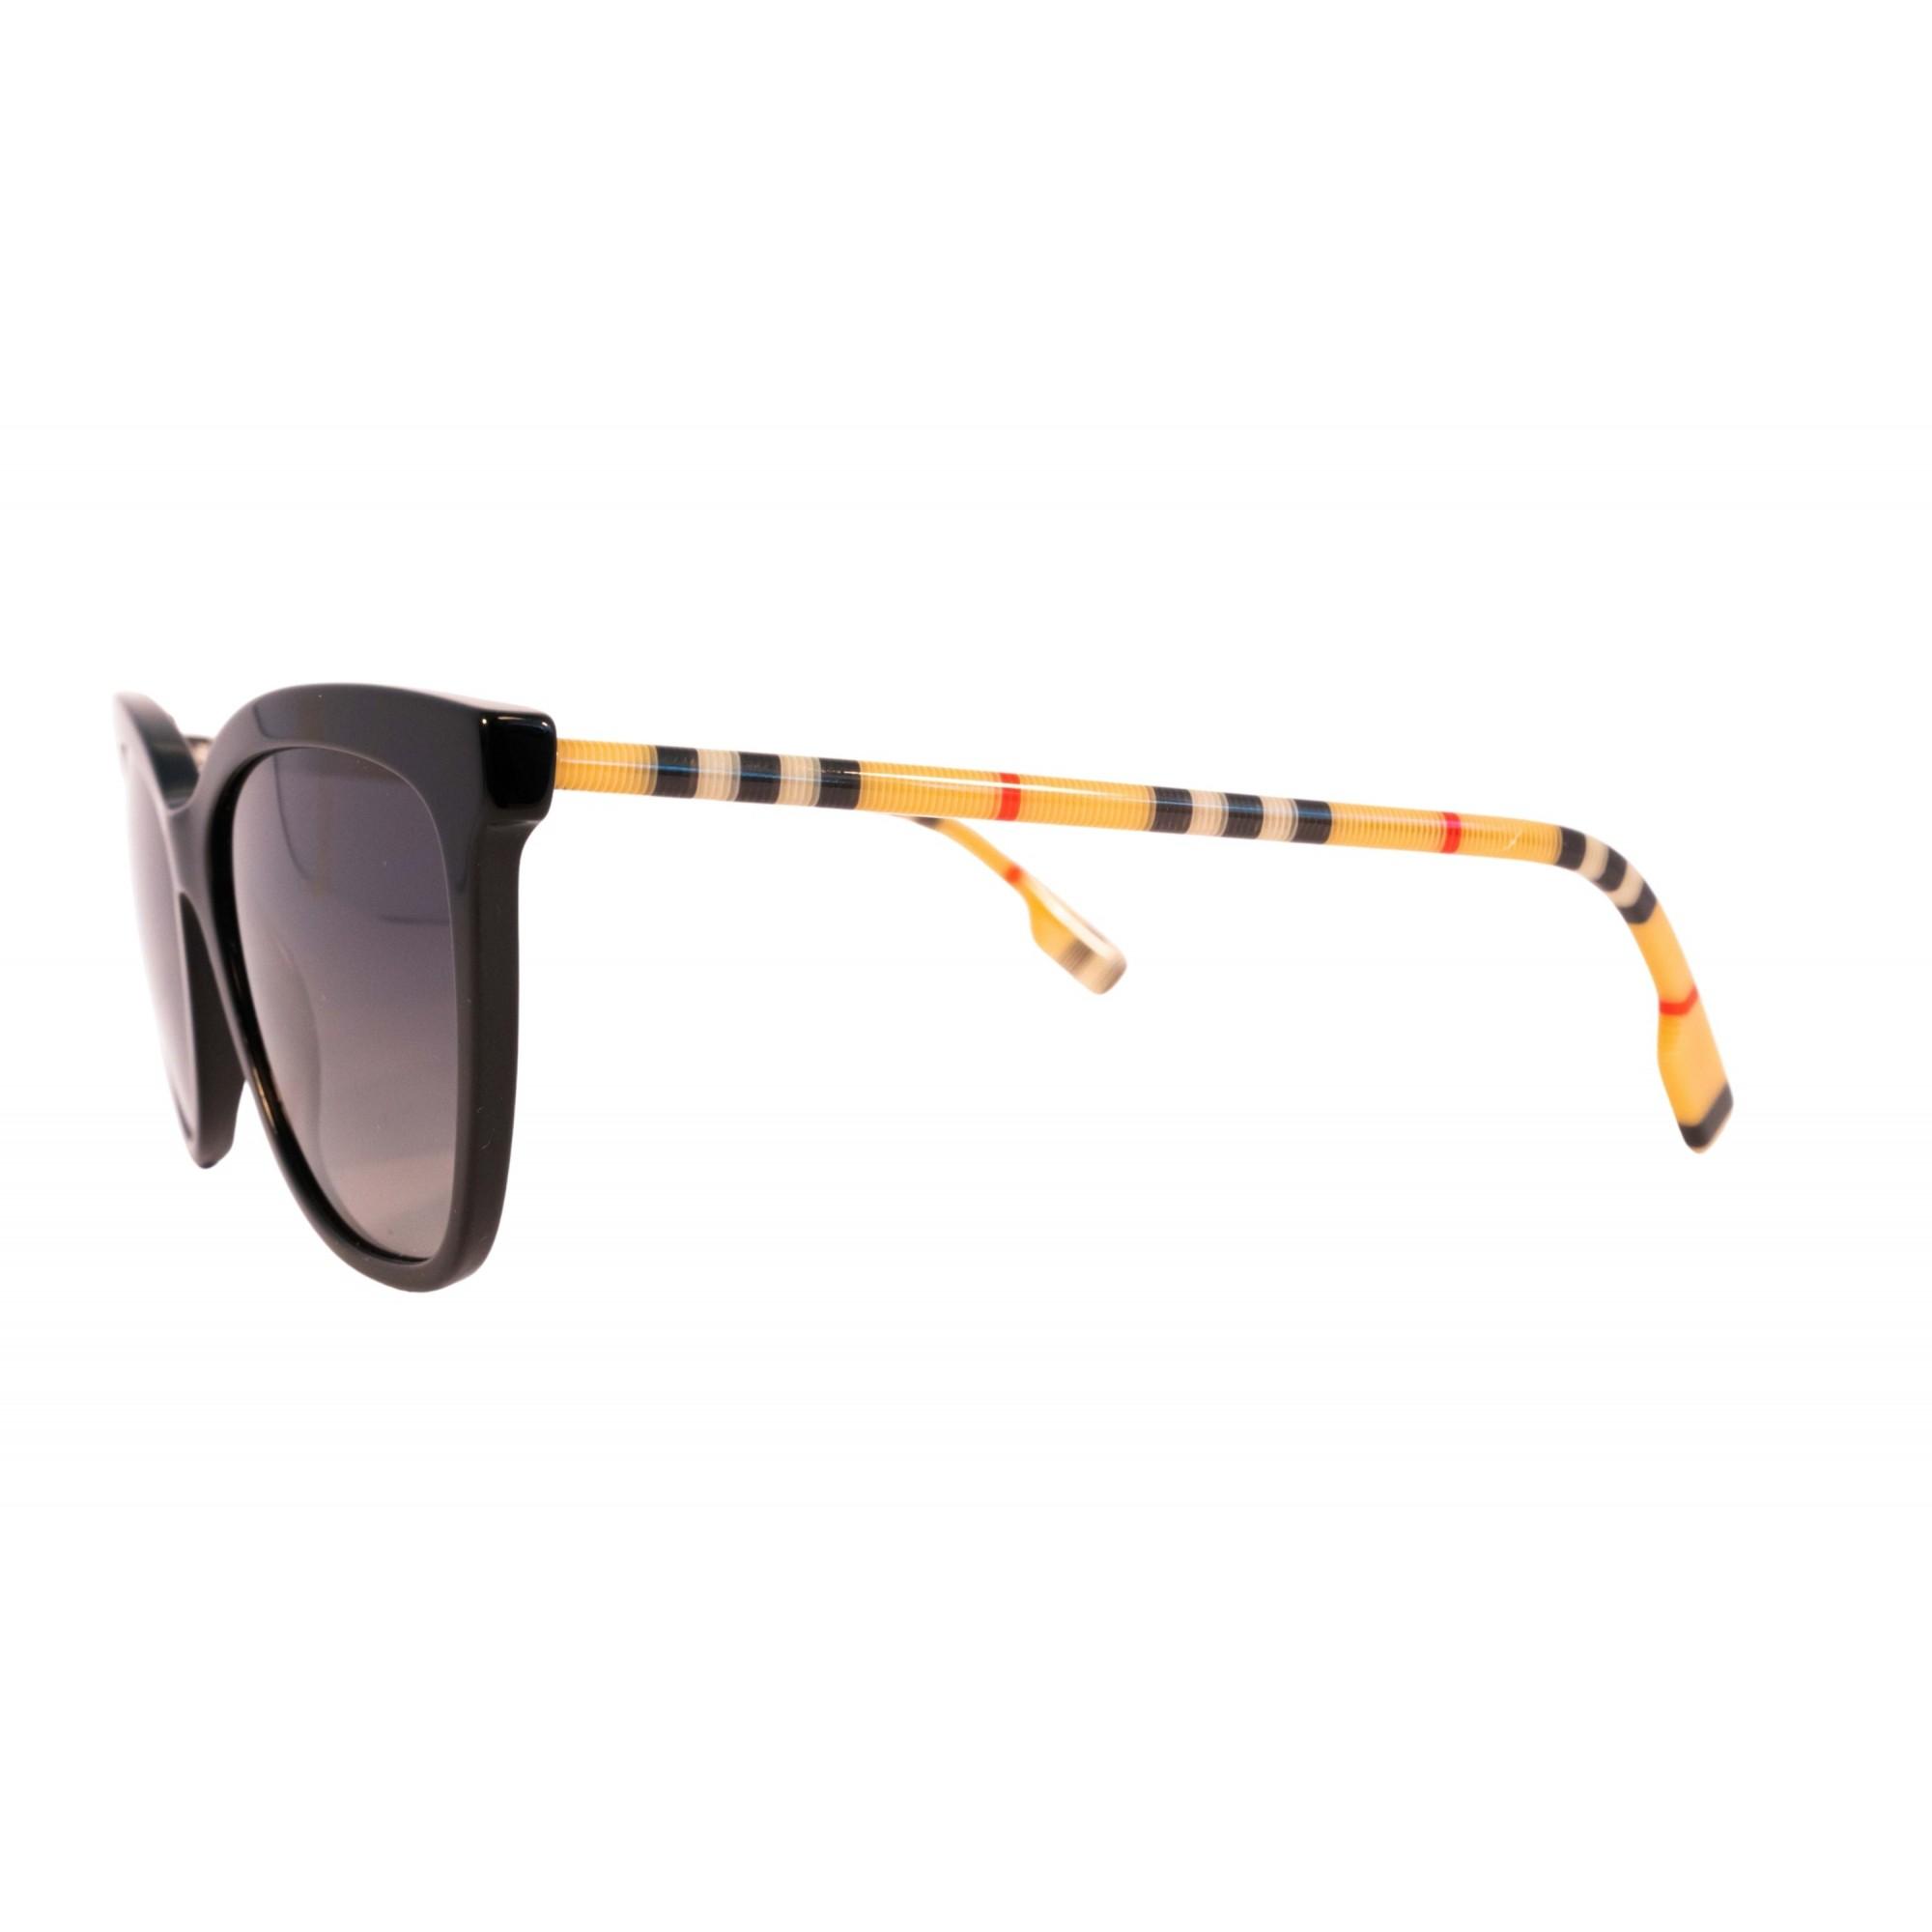 Óculos Burberry Cat Eye be4308 3853T3 56 Preto